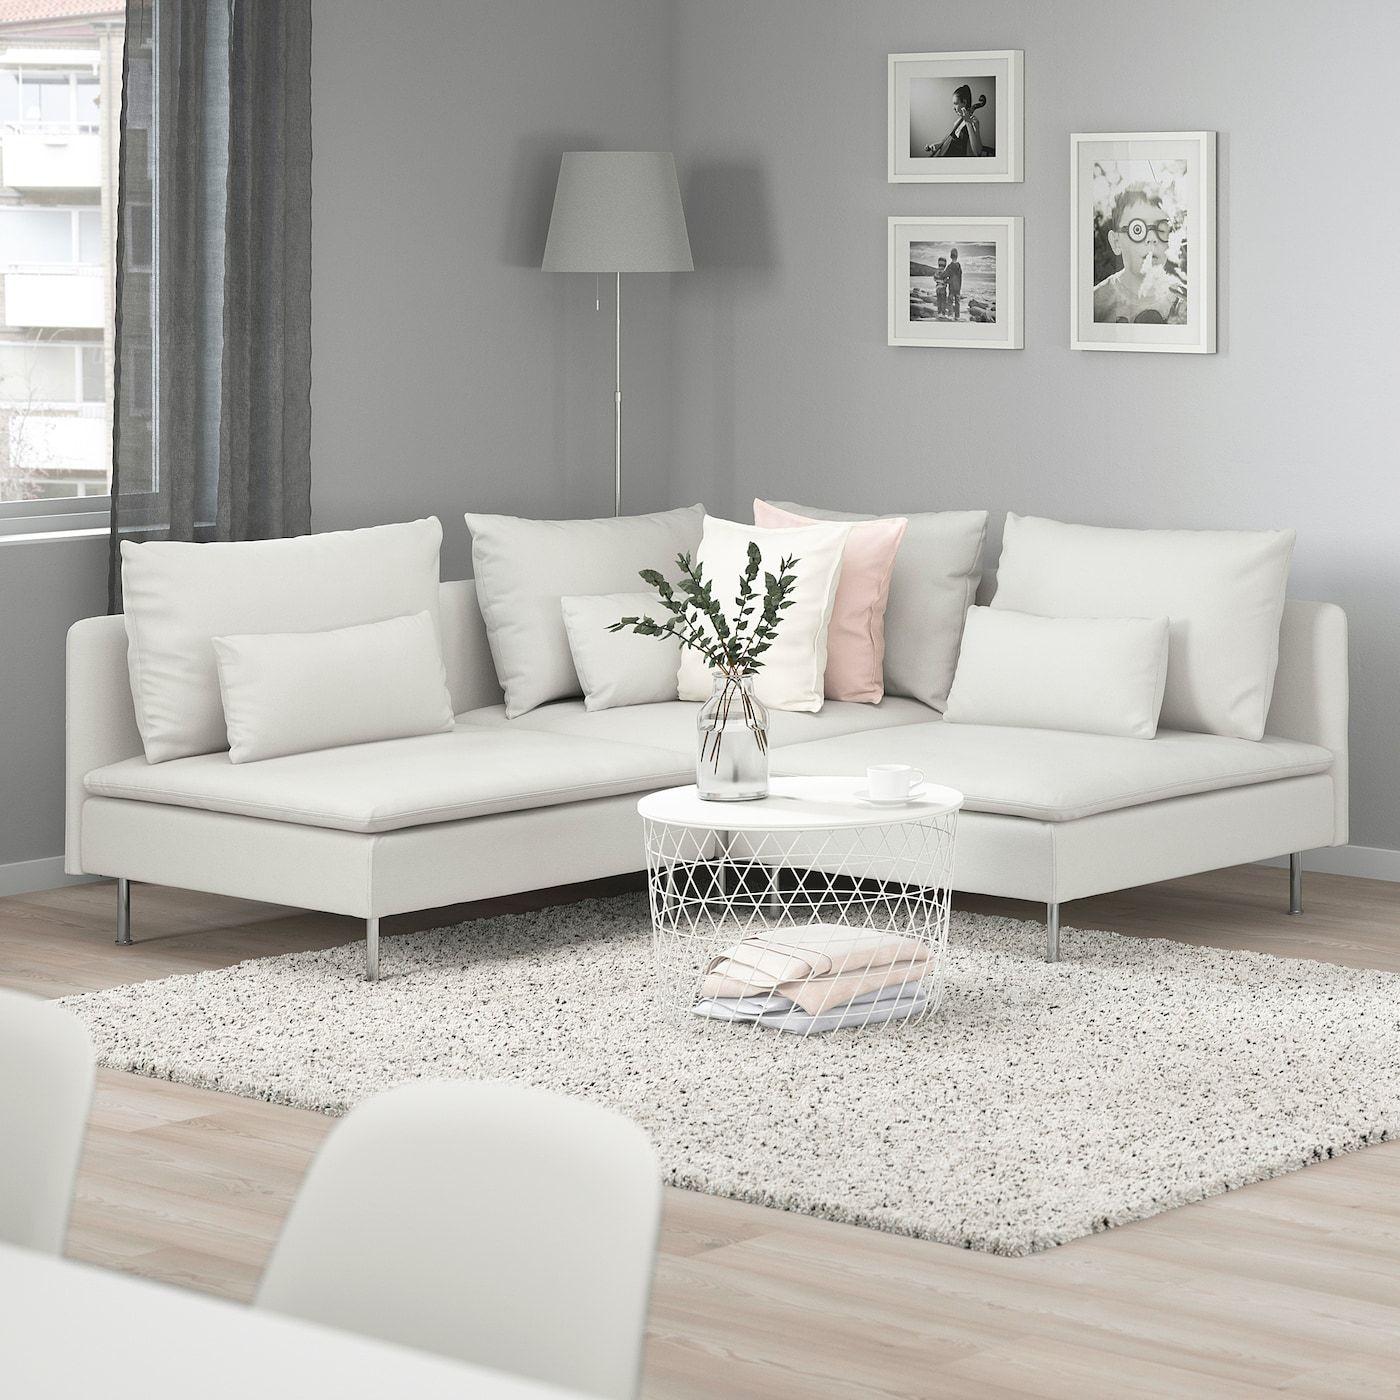 Soderhamn Ecksofa 3 Sitzig Finnsta Weiss Ikea Deutschland White Furniture Living Room Living Room Grey Apartment Living Room Design